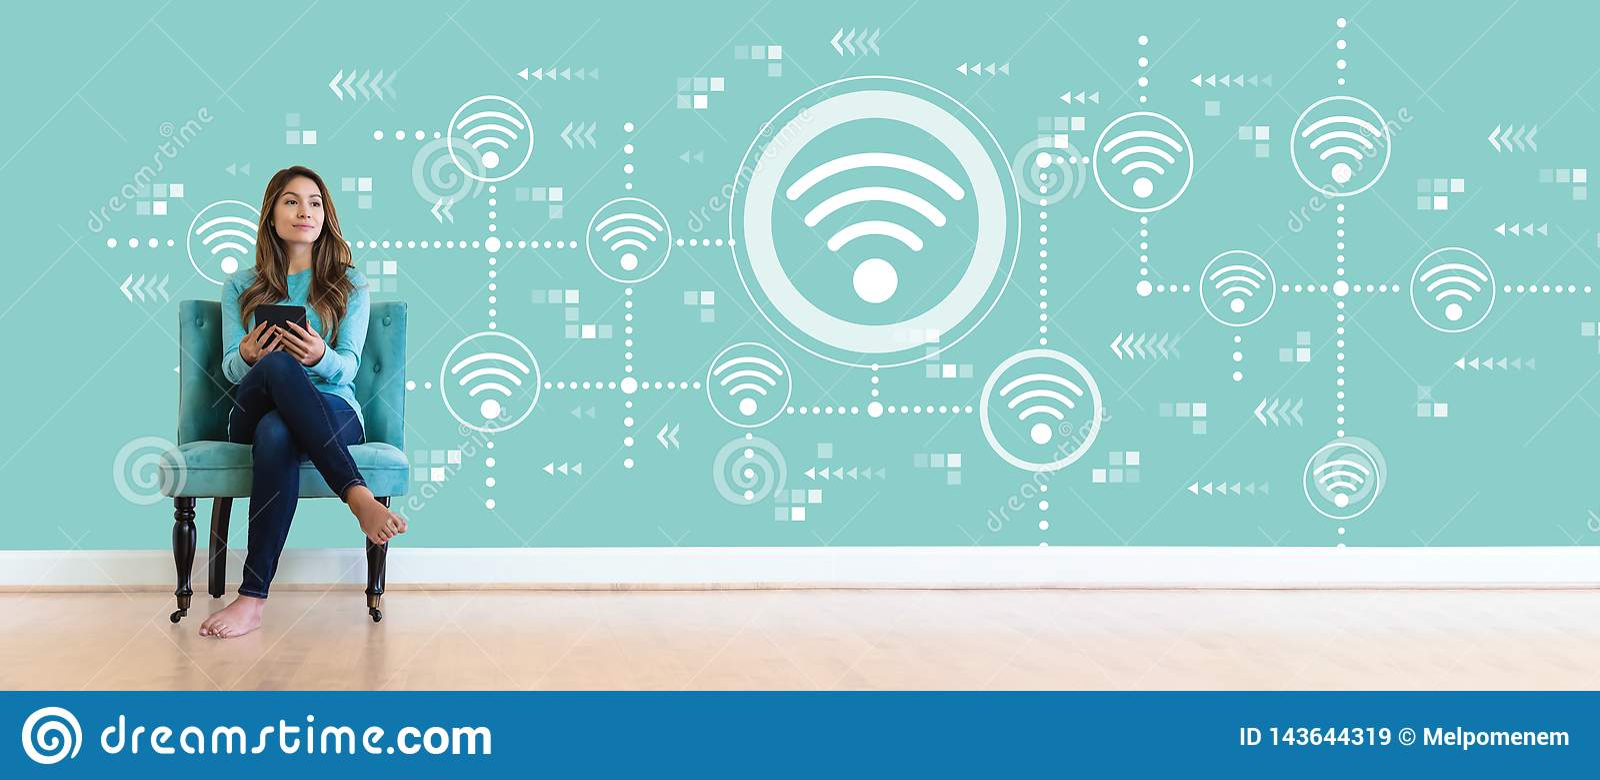 Wifi begrepp med den unga kvinnan